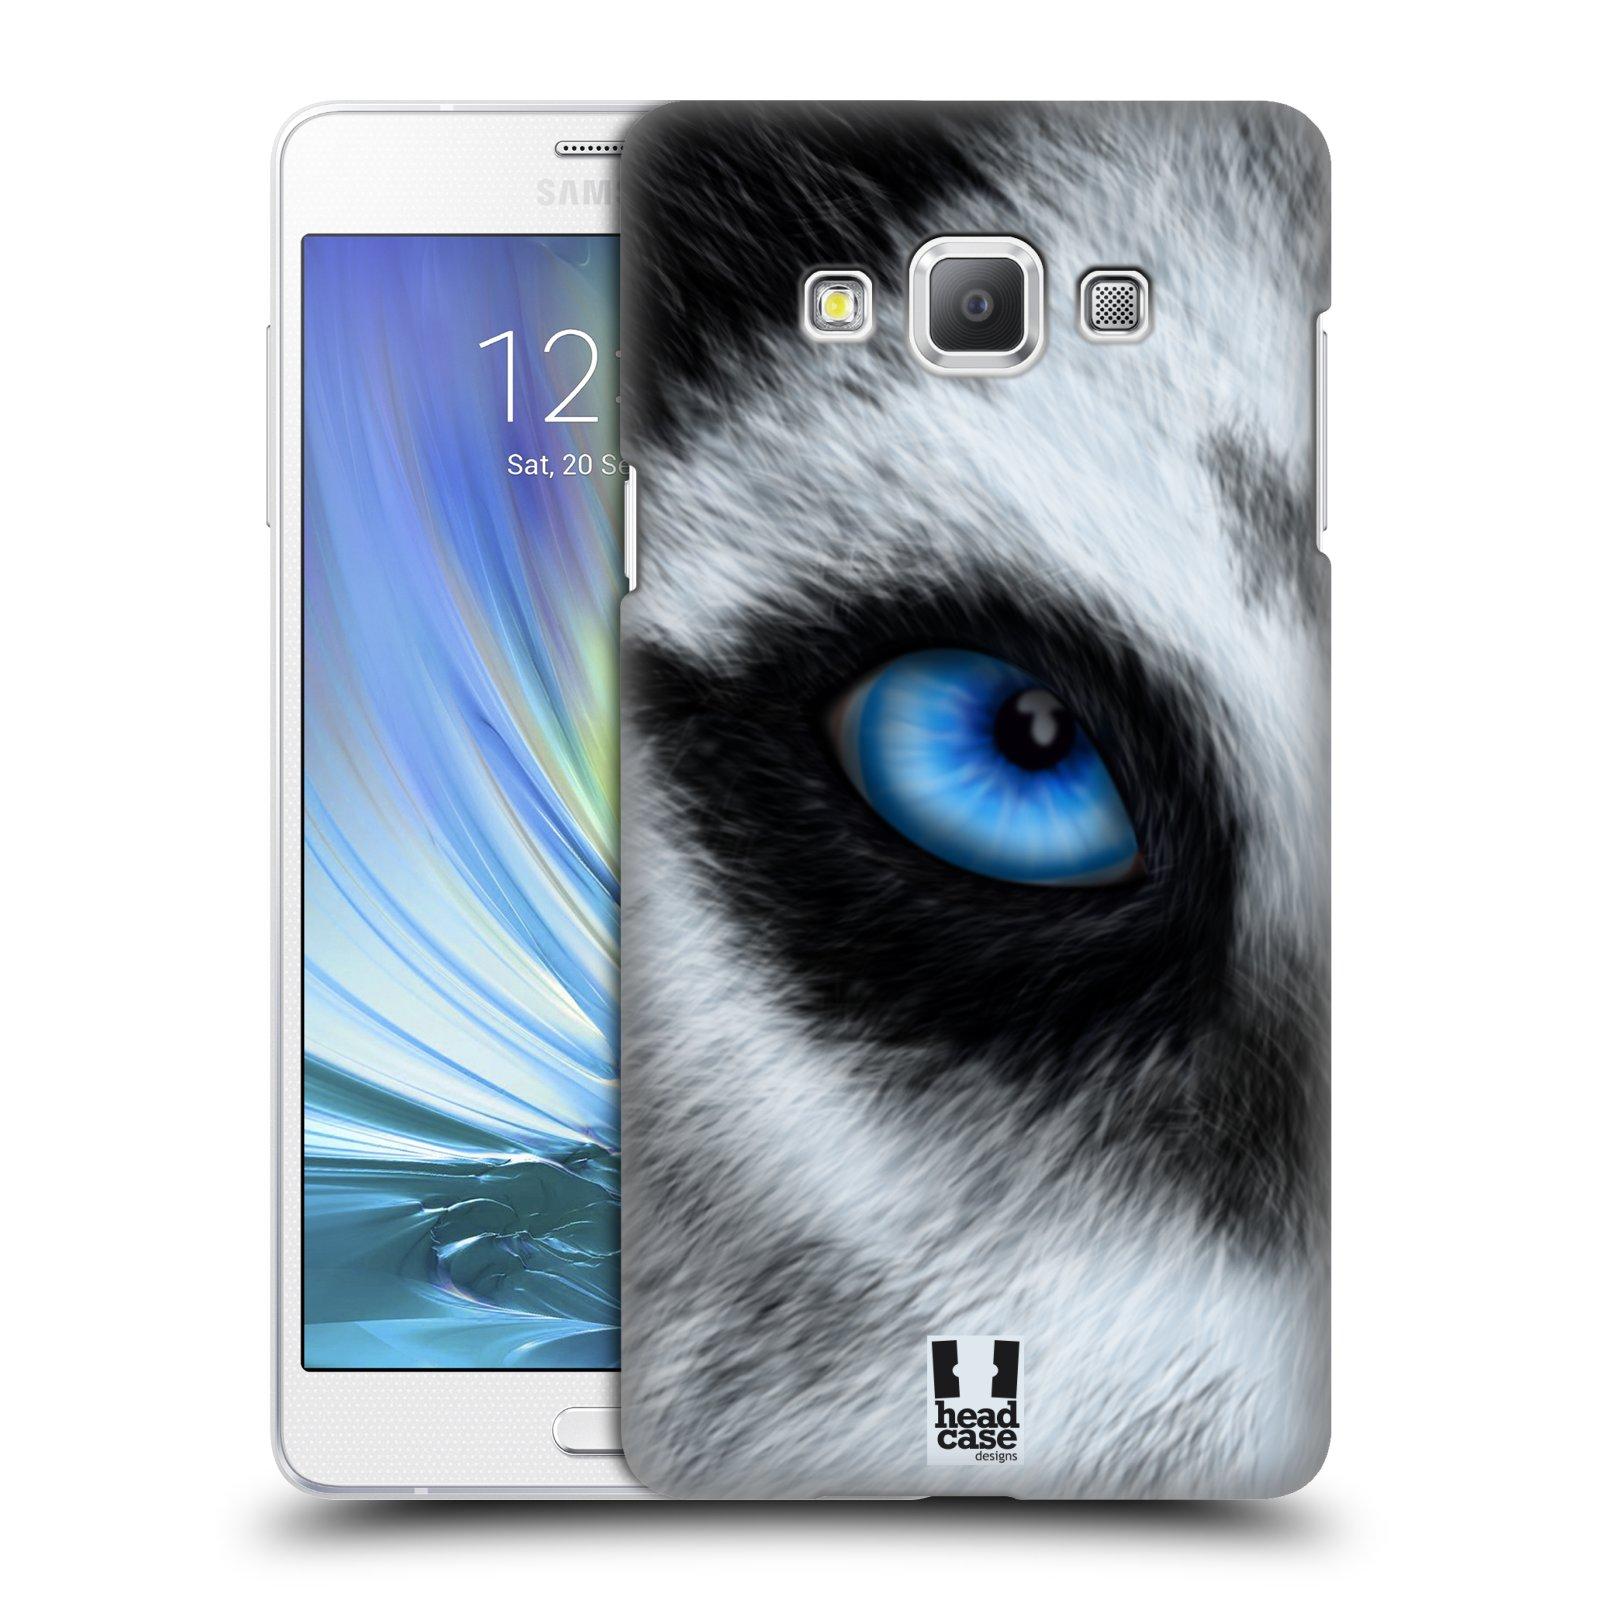 HEAD CASE plastový obal na mobil SAMSUNG GALAXY A7 vzor pohled zvířete oko pes husky